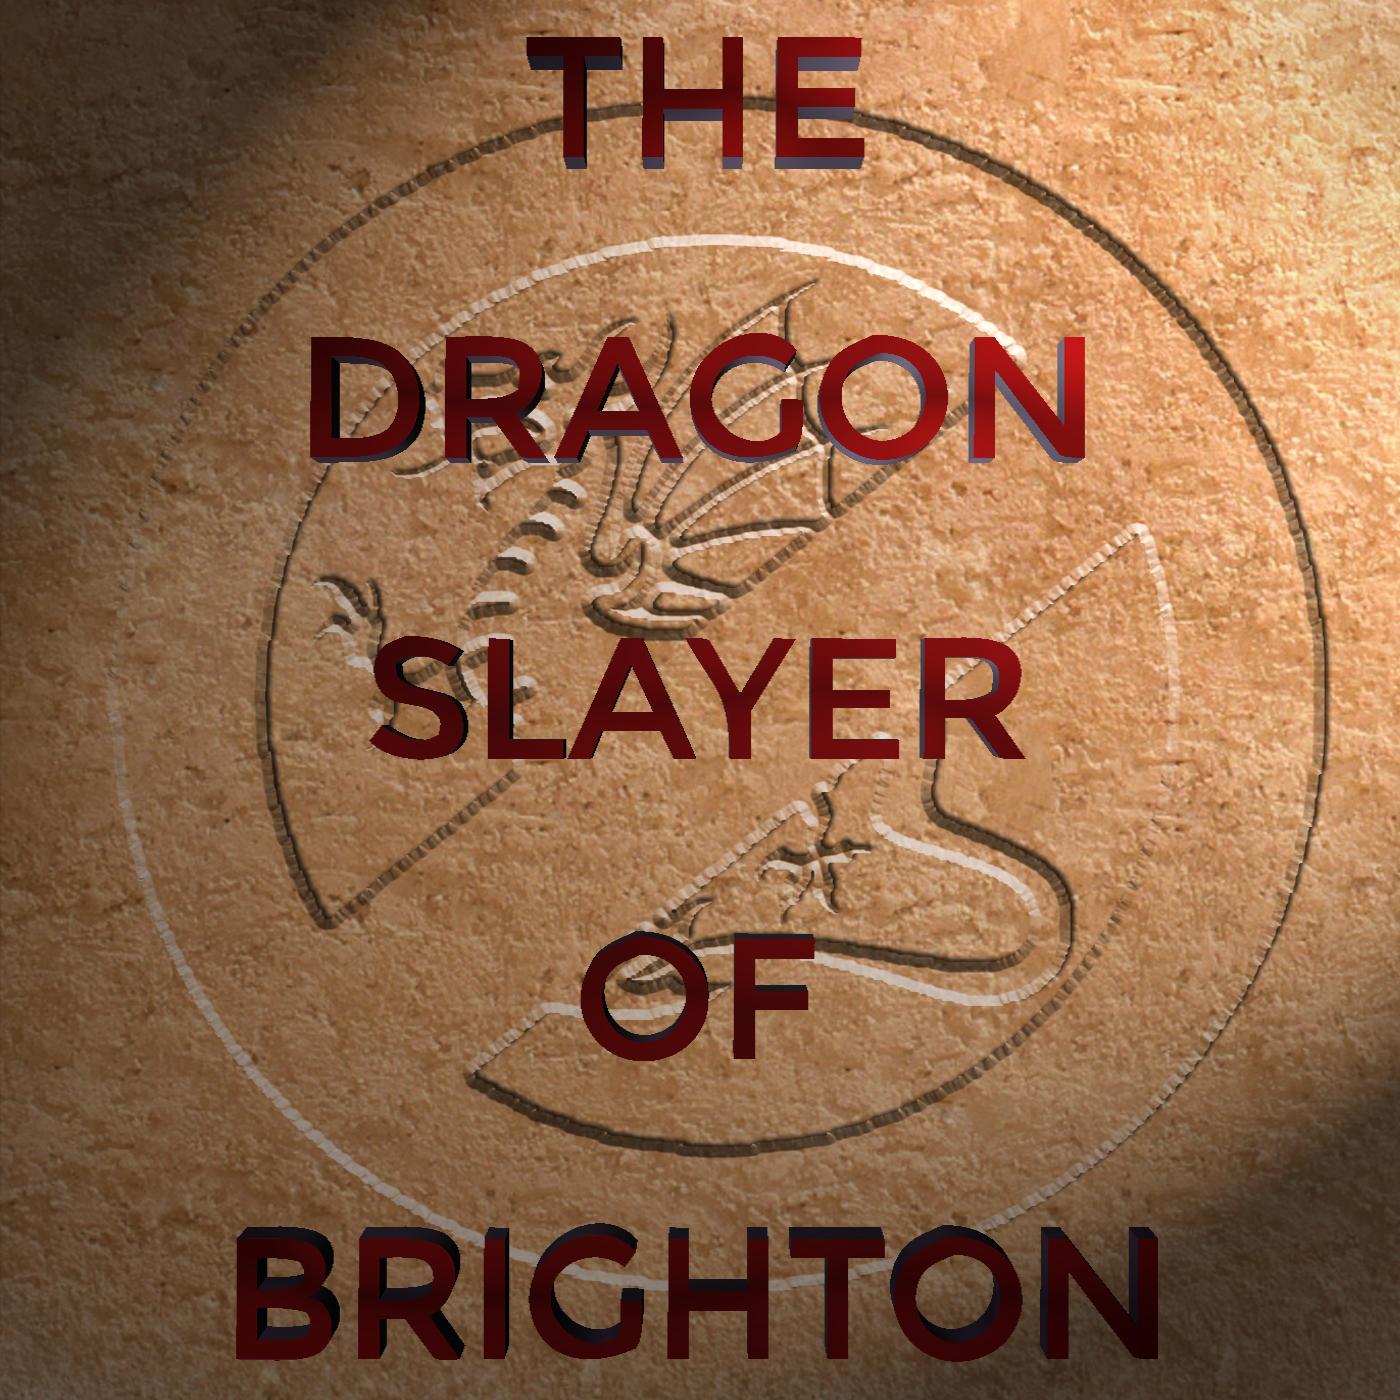 The Dragon Slayer of Brighton